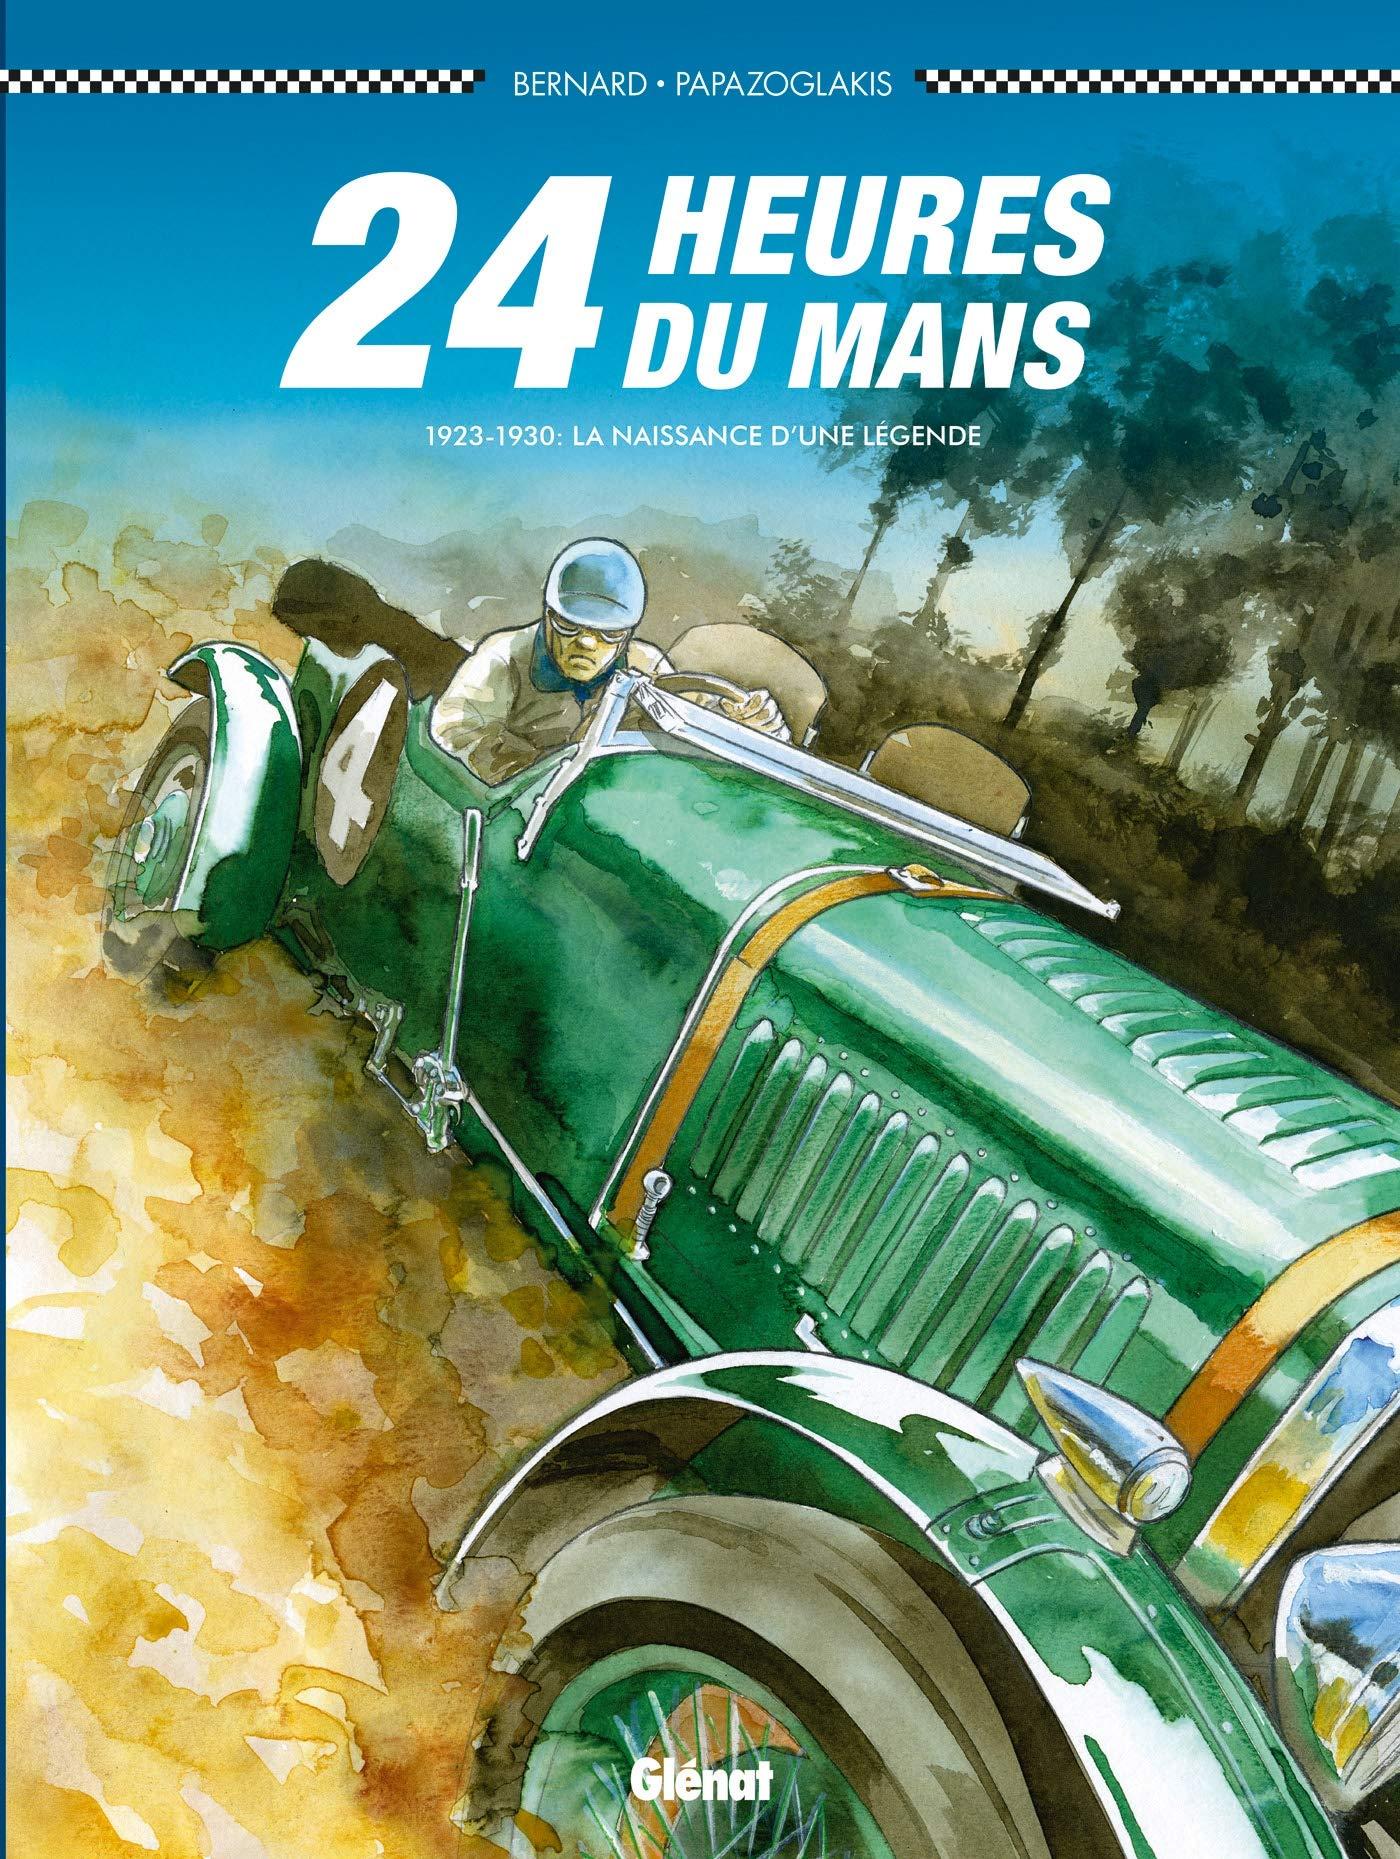 24 Heures du Mans 1 - 1923-1930: Les Bentley Boys